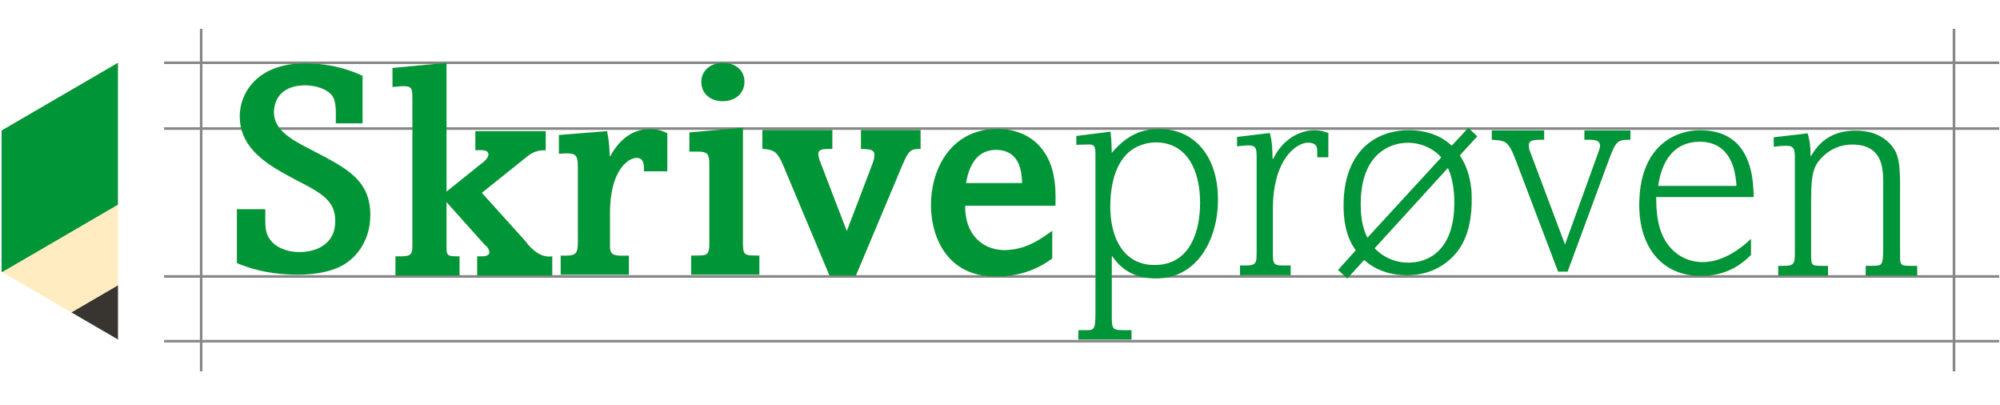 Skriveprøvens logo